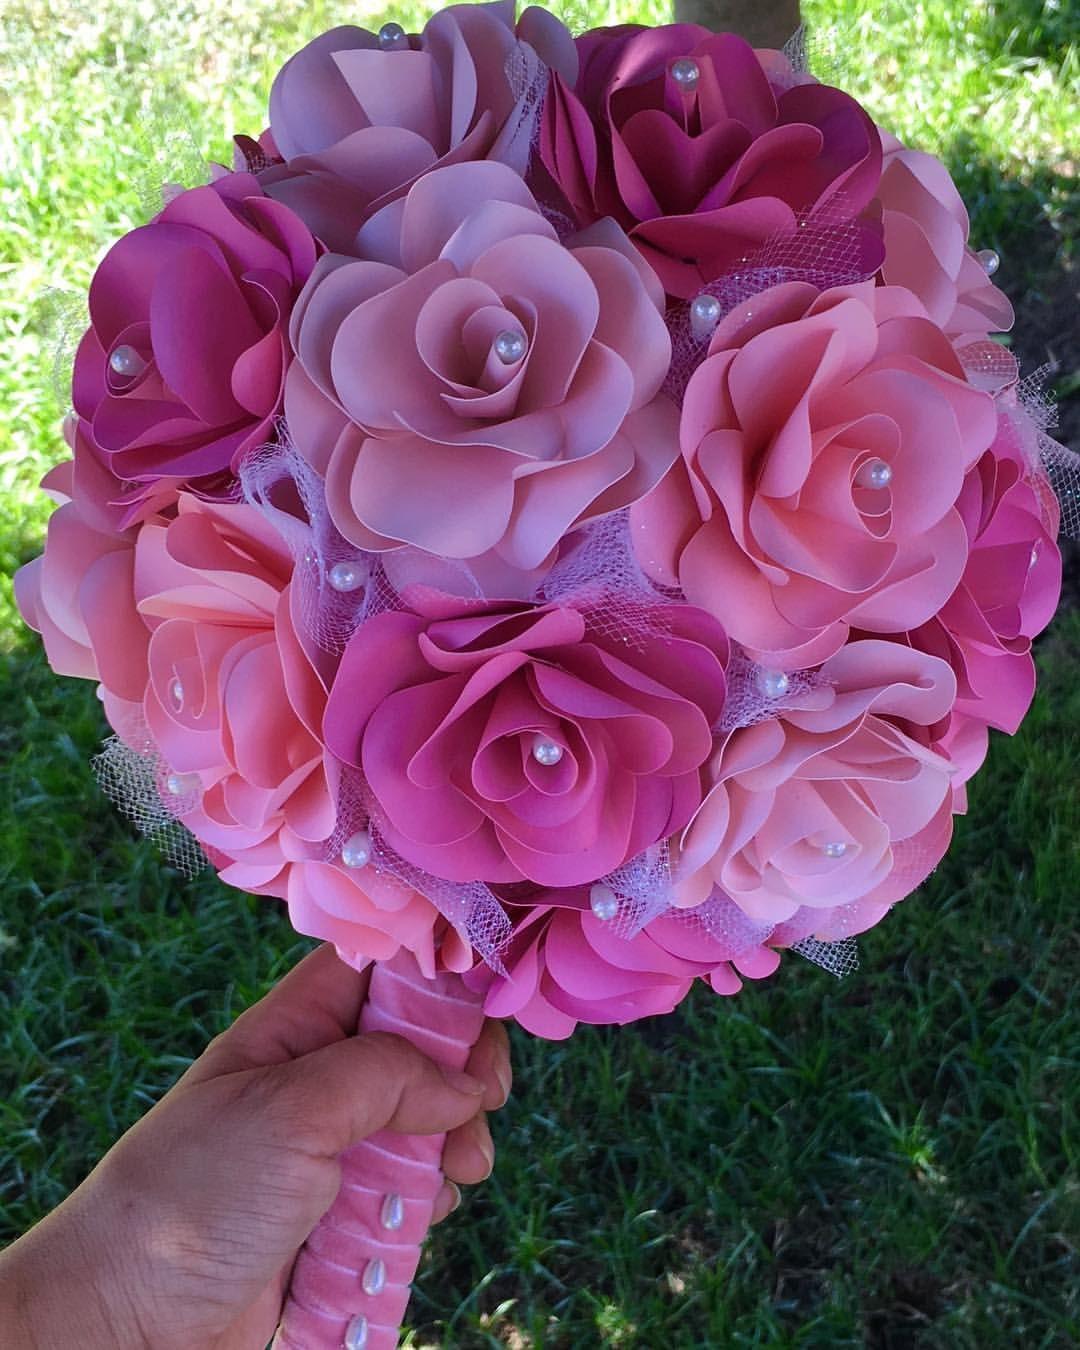 Crafts by betty craftsbybetty on instagram paper flower bouquet crafts by betty craftsbybetty on instagram paper flower bouquet wedding bouquet izmirmasajfo